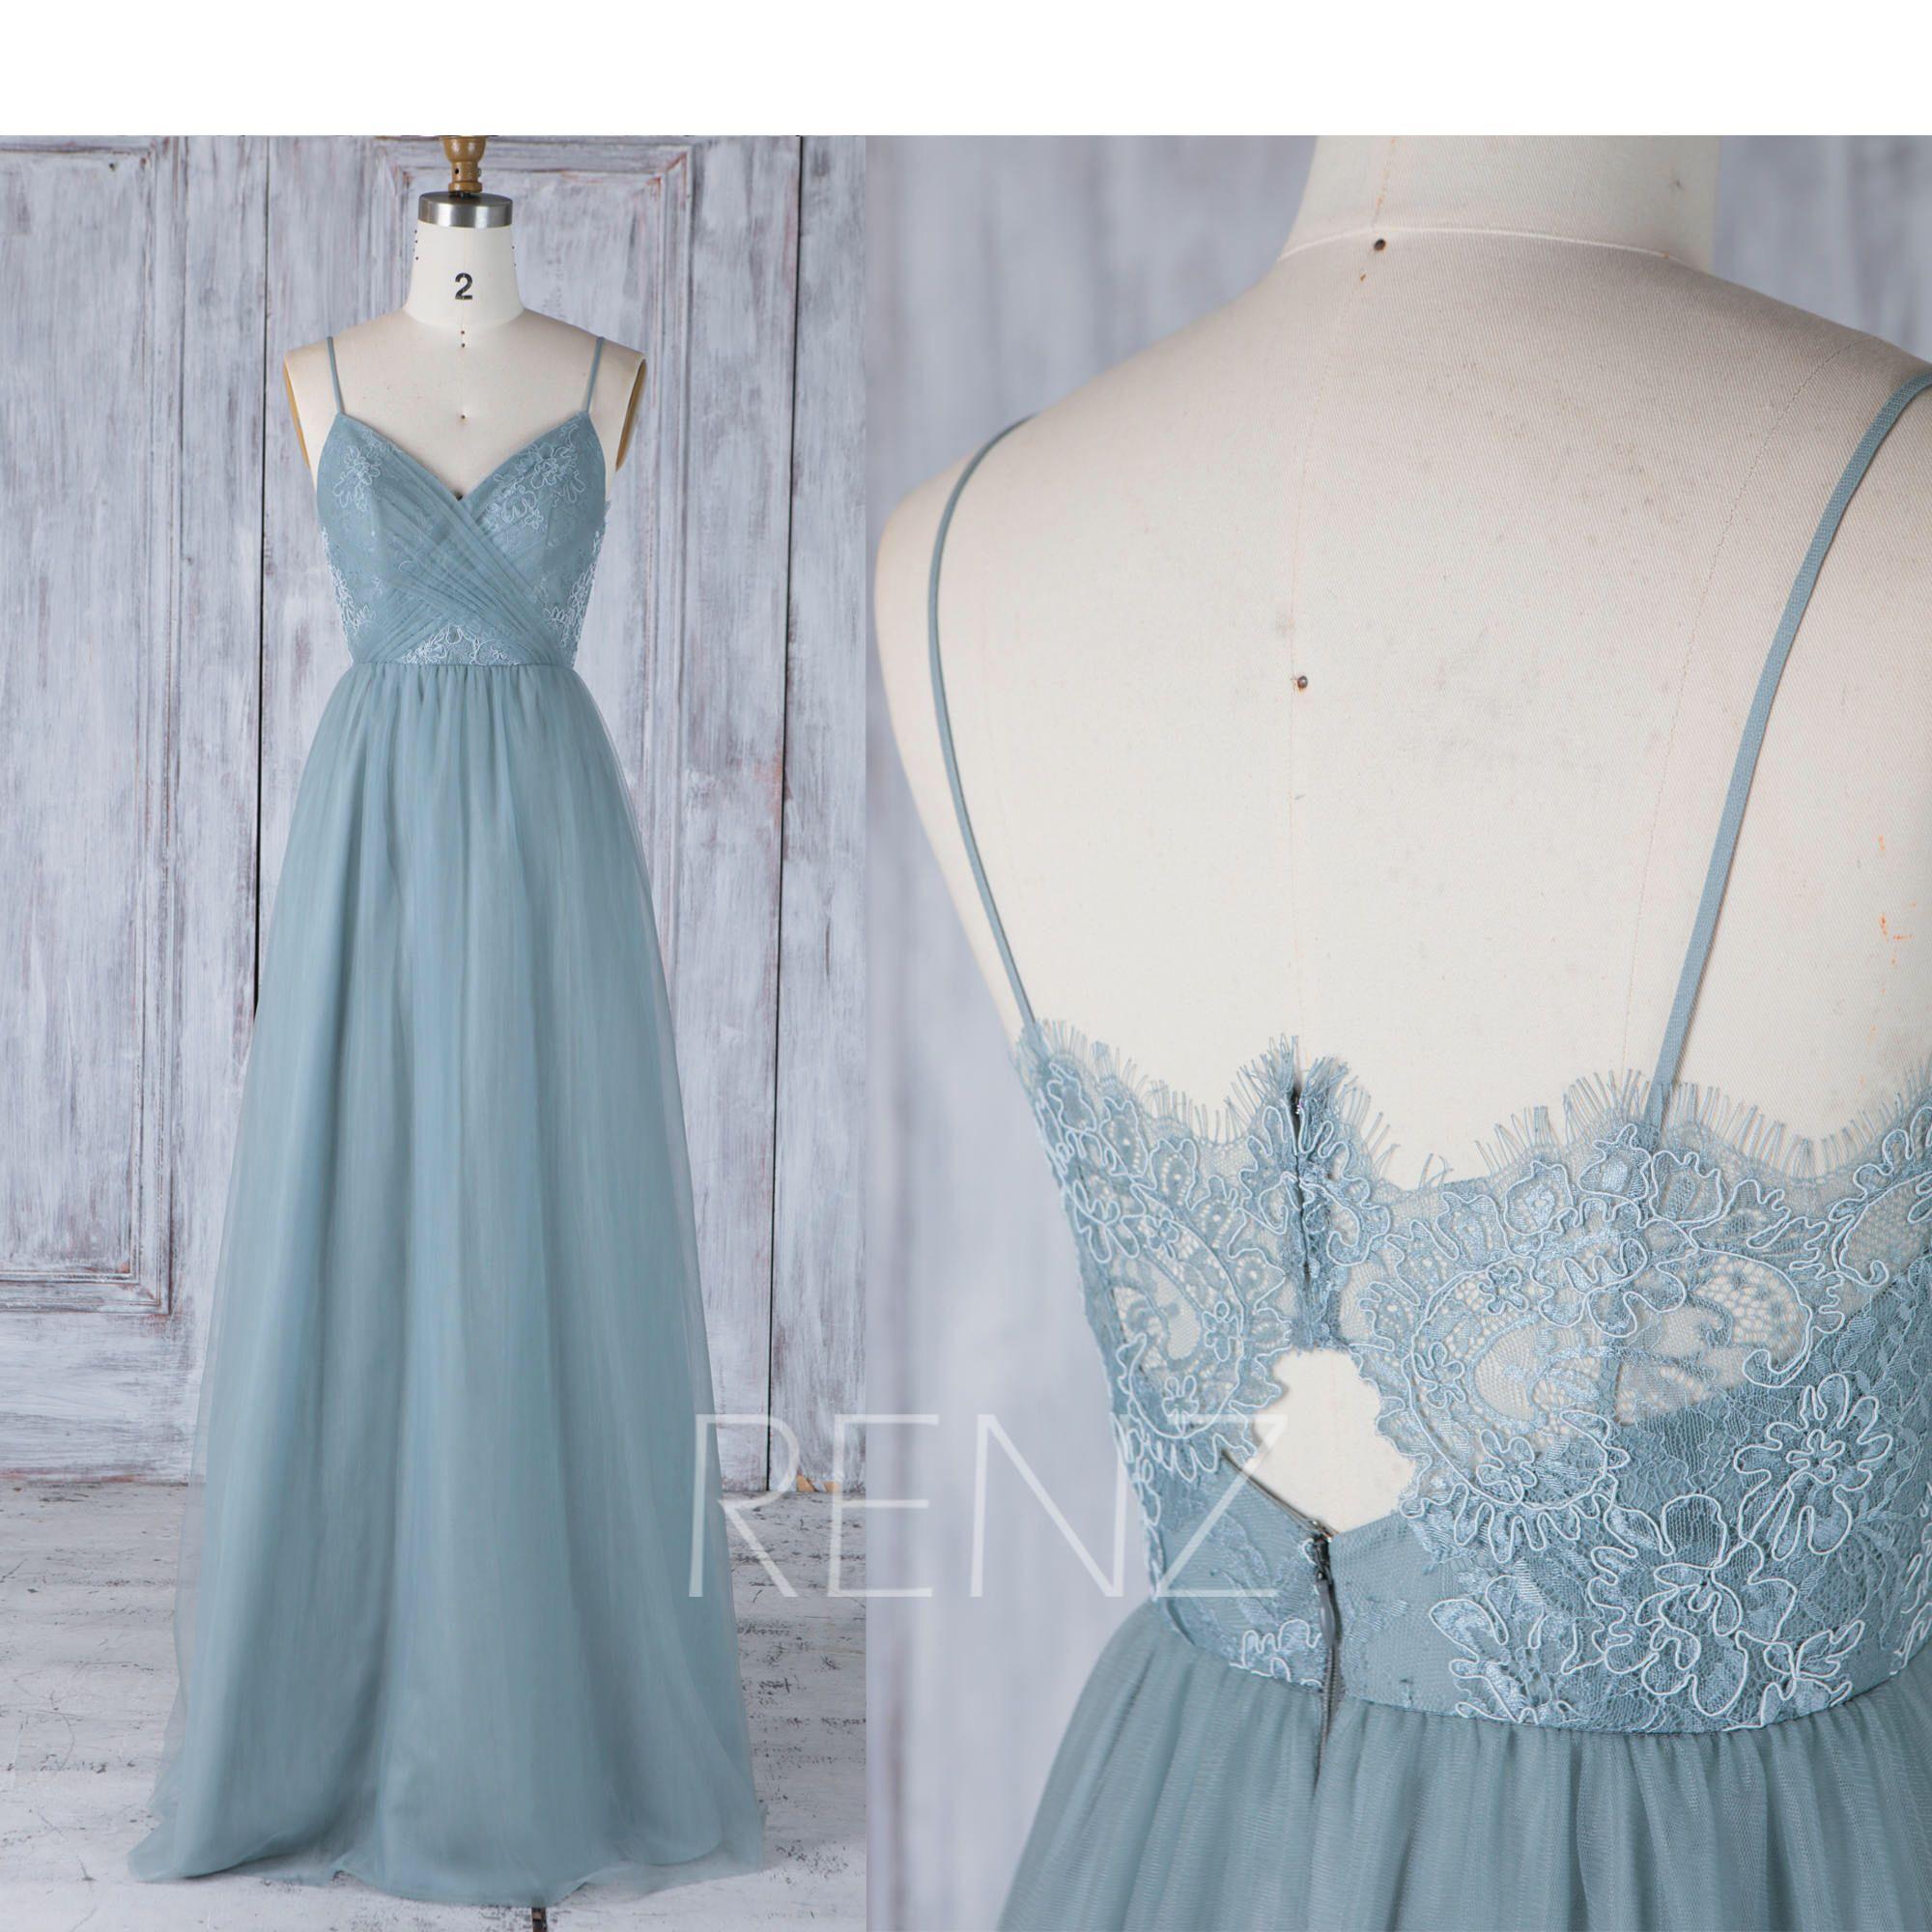 Bridesmaid dress dusty blue spaghetti straps tulle wedding dress